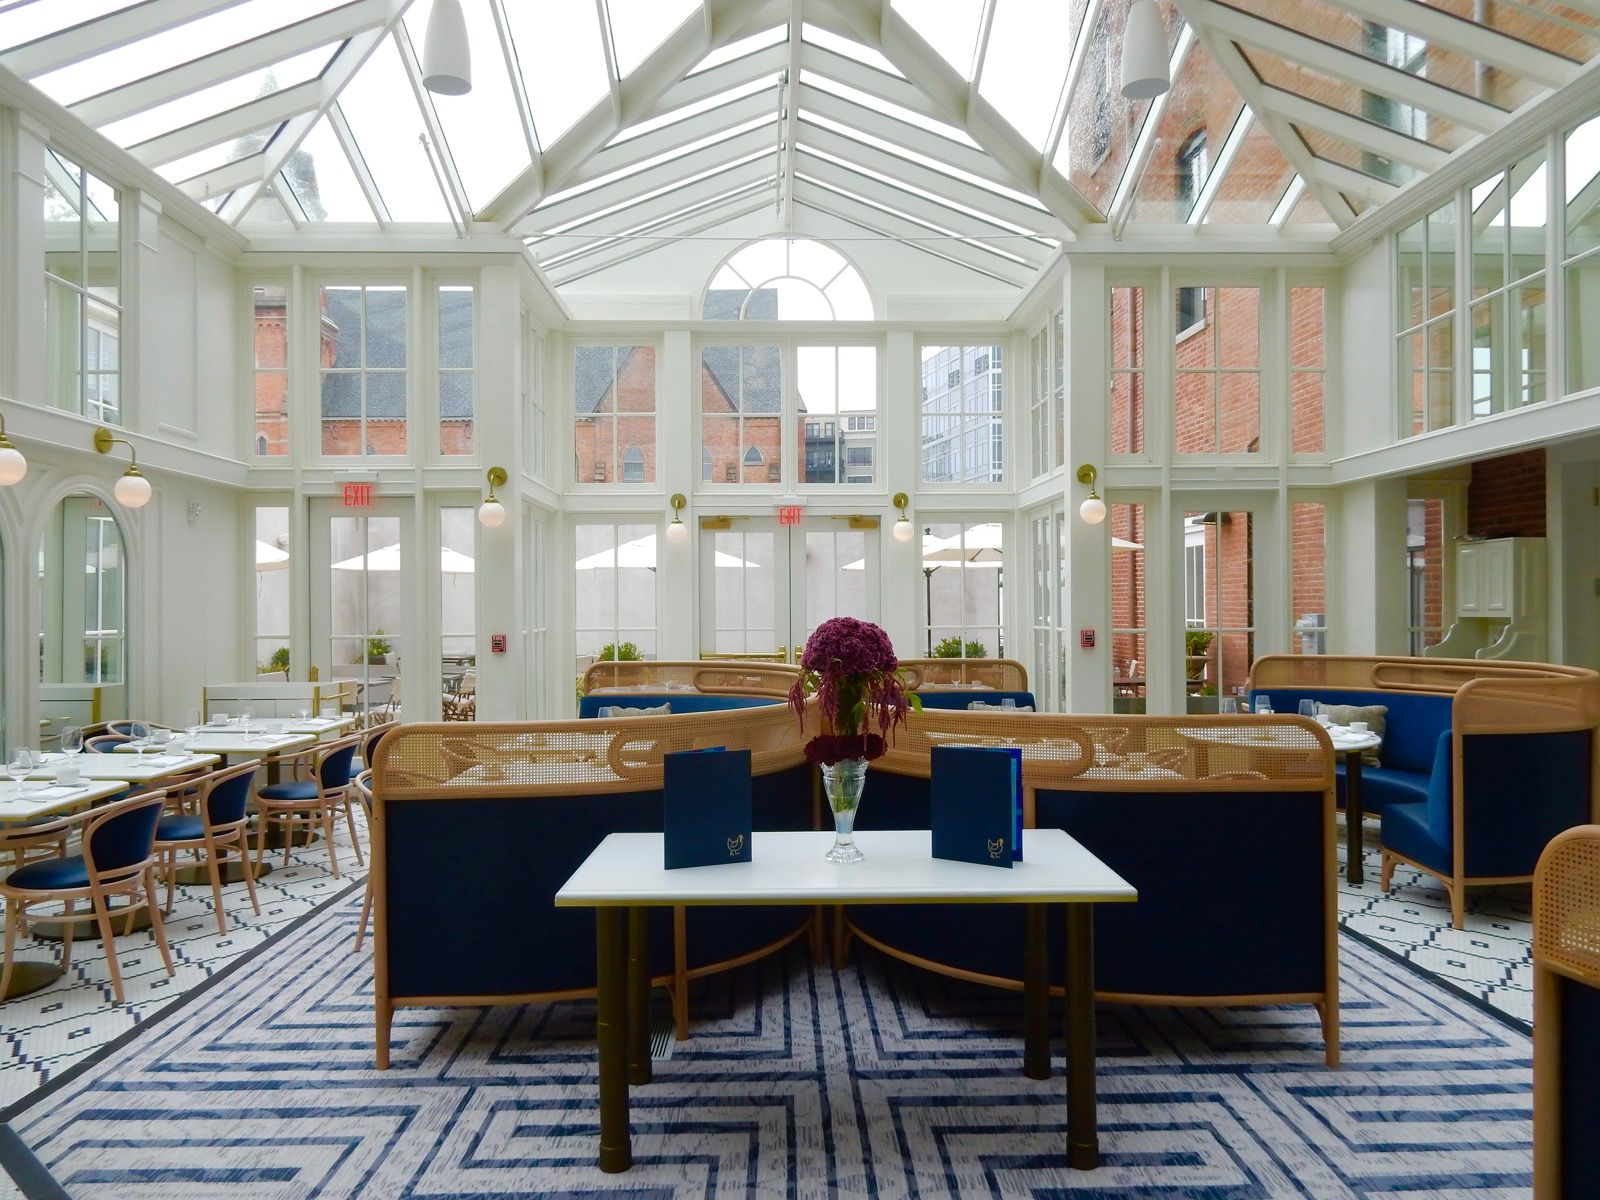 Adelphi Hotel Saratoga Springs Ny Historic Chic Restaurant